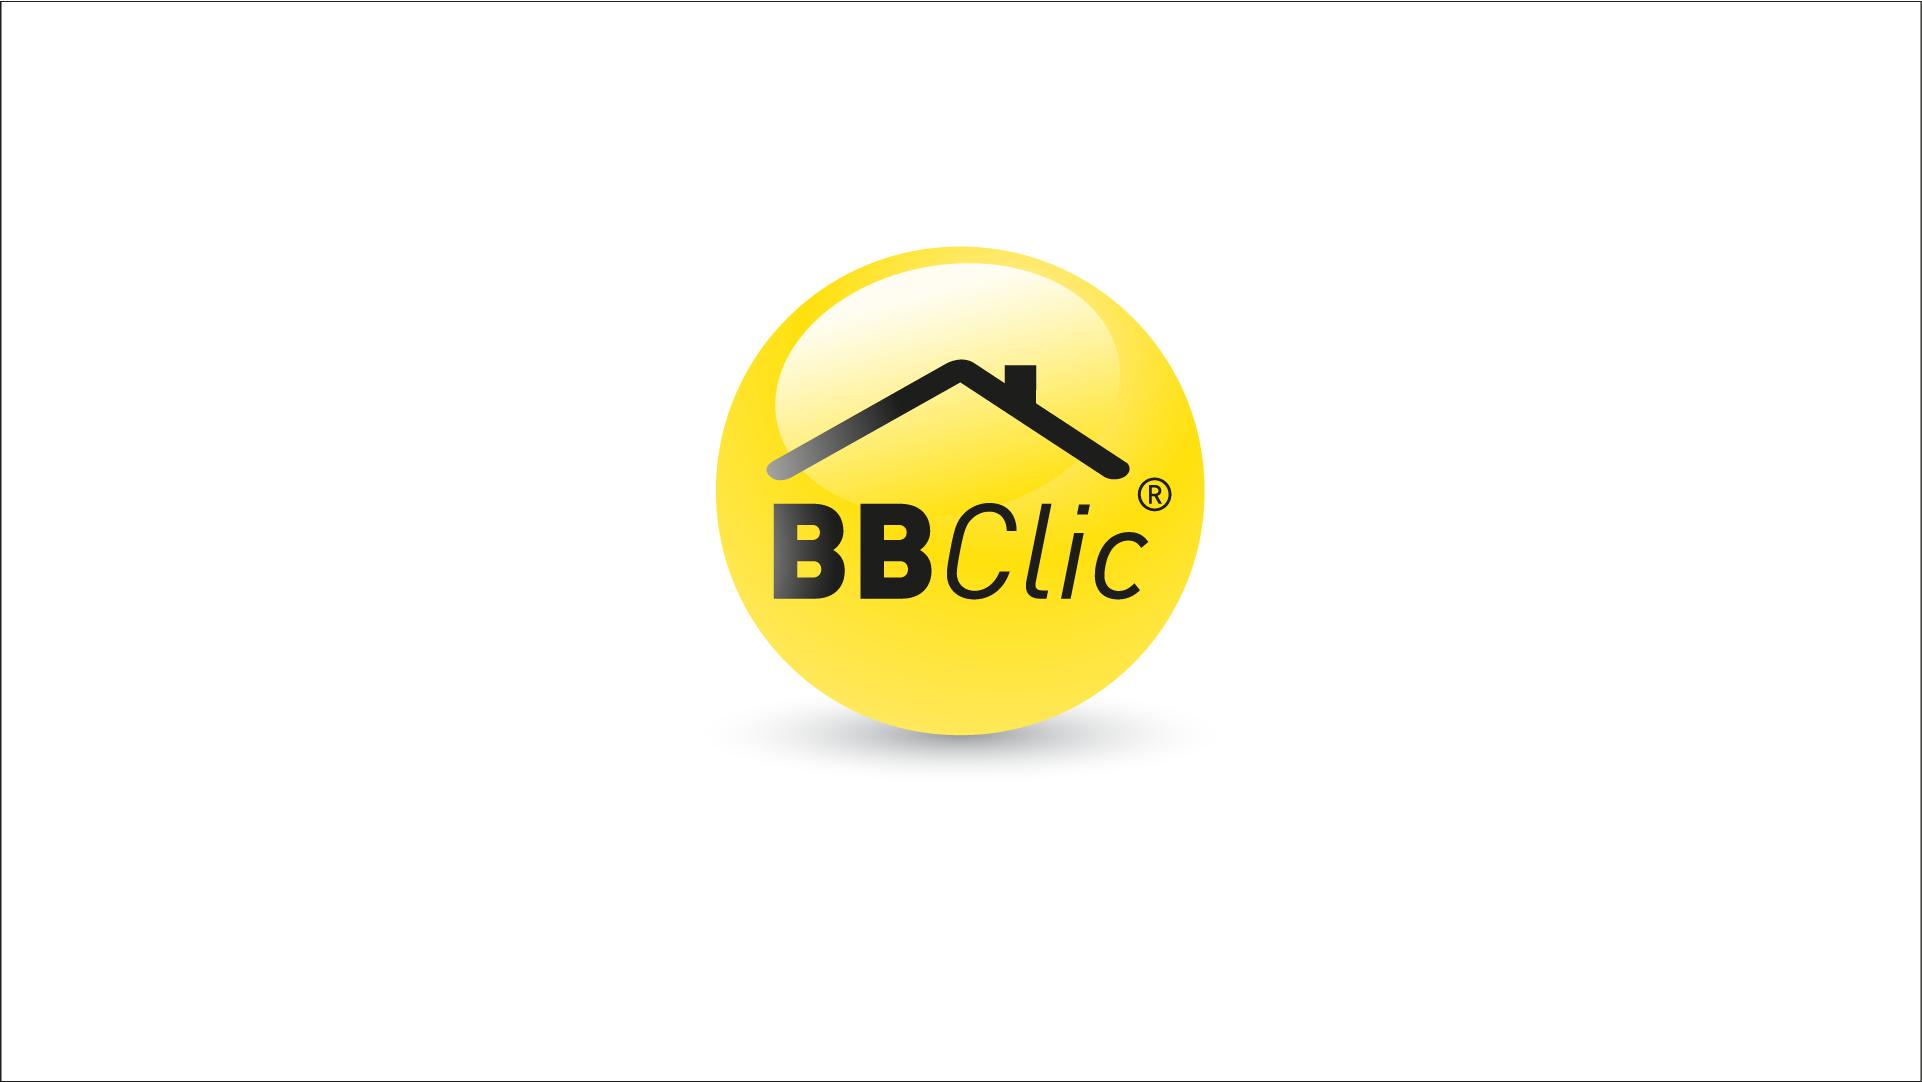 BBclic-CERIB